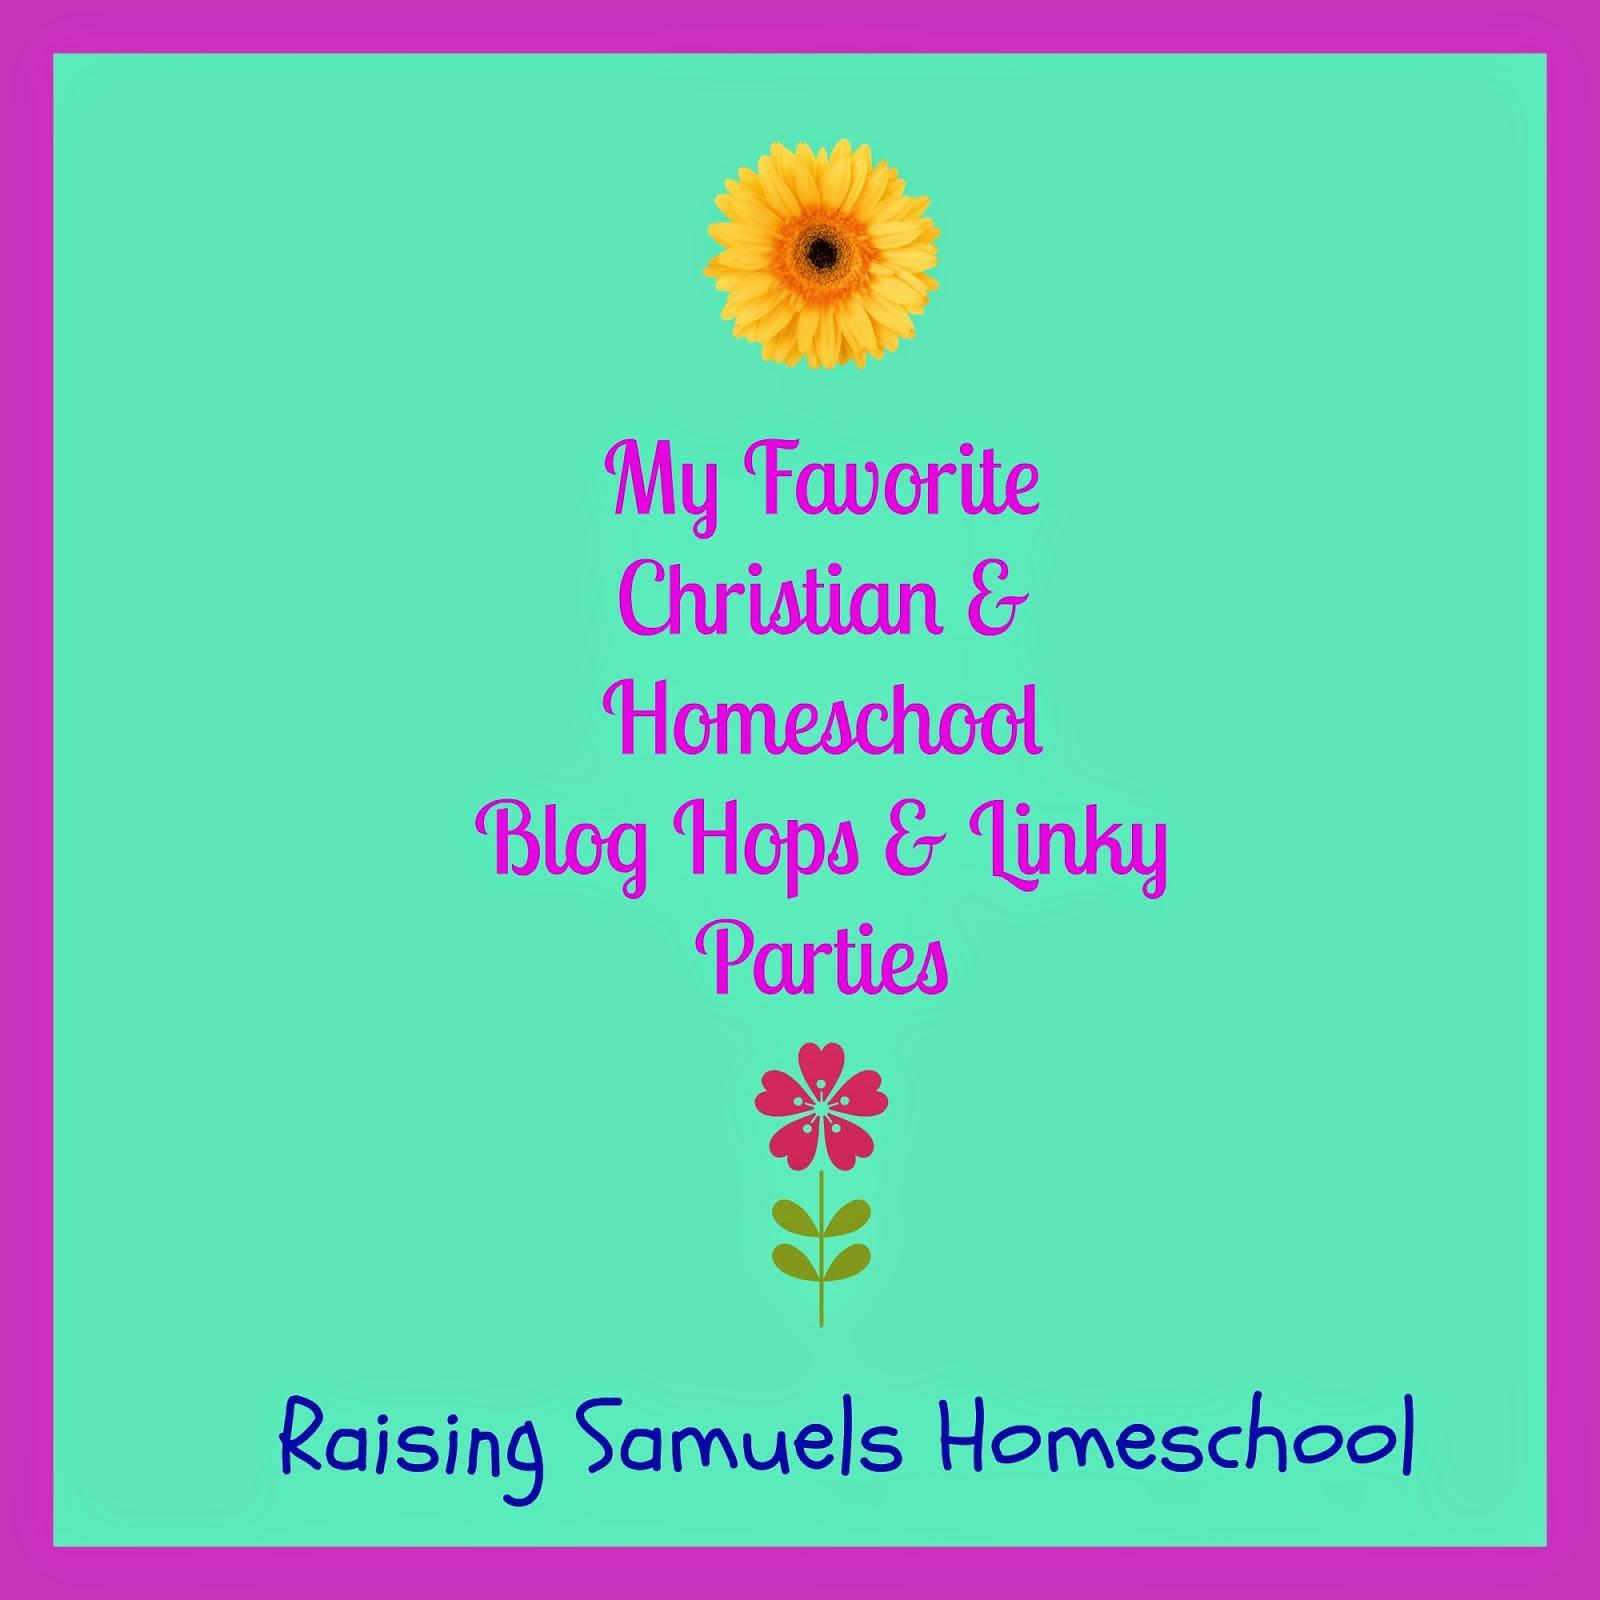 My Favorite Christian & Homeschool Blog Hops & Linky Parties